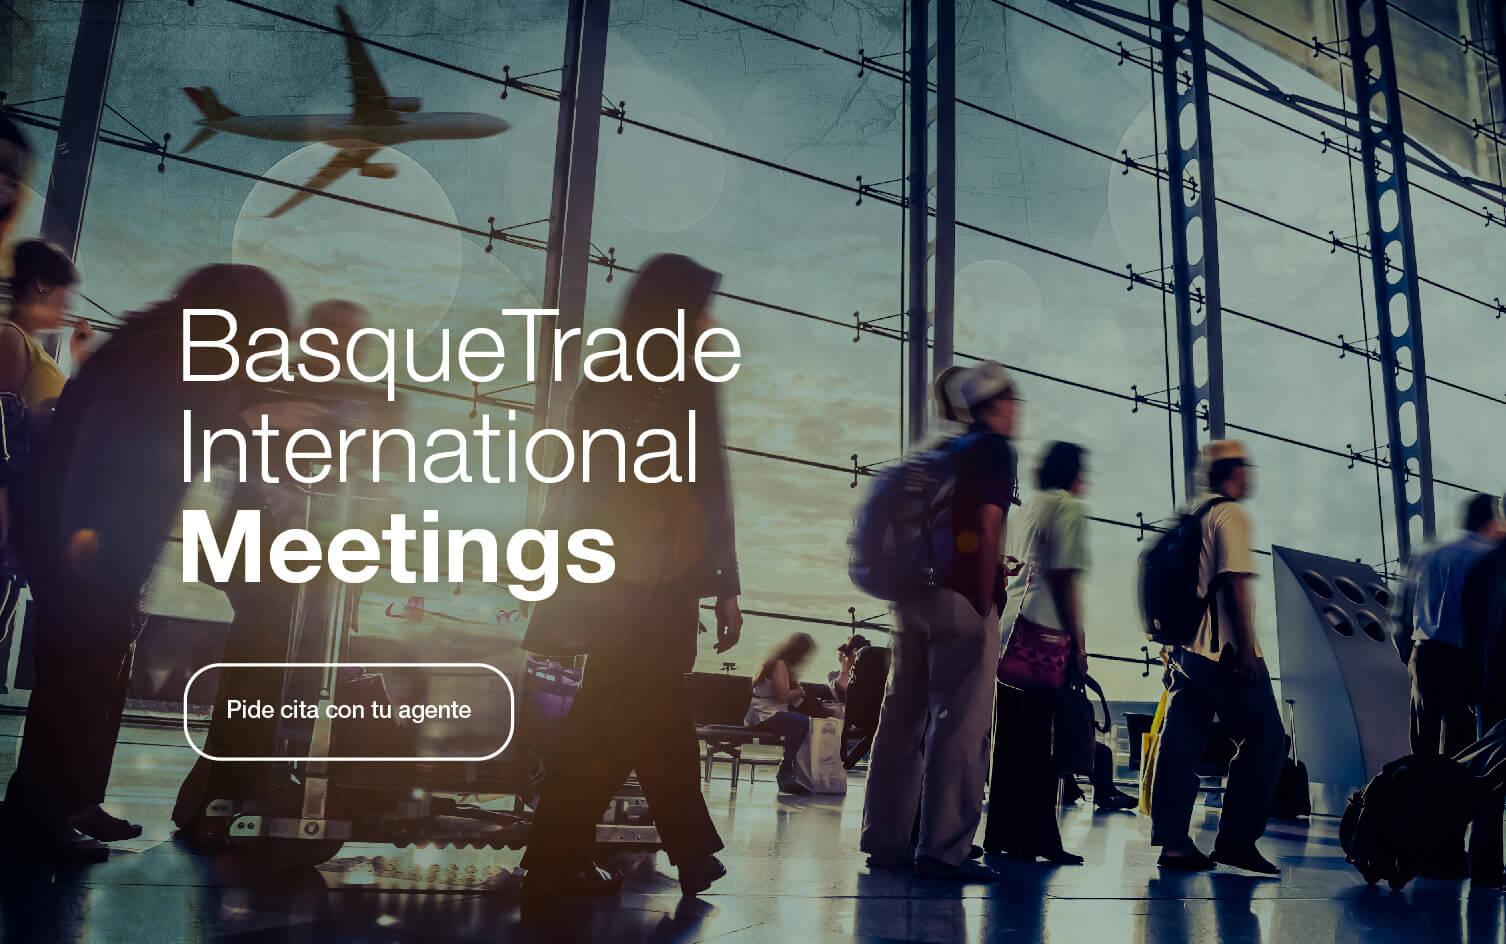 Basque Trade International Meetings